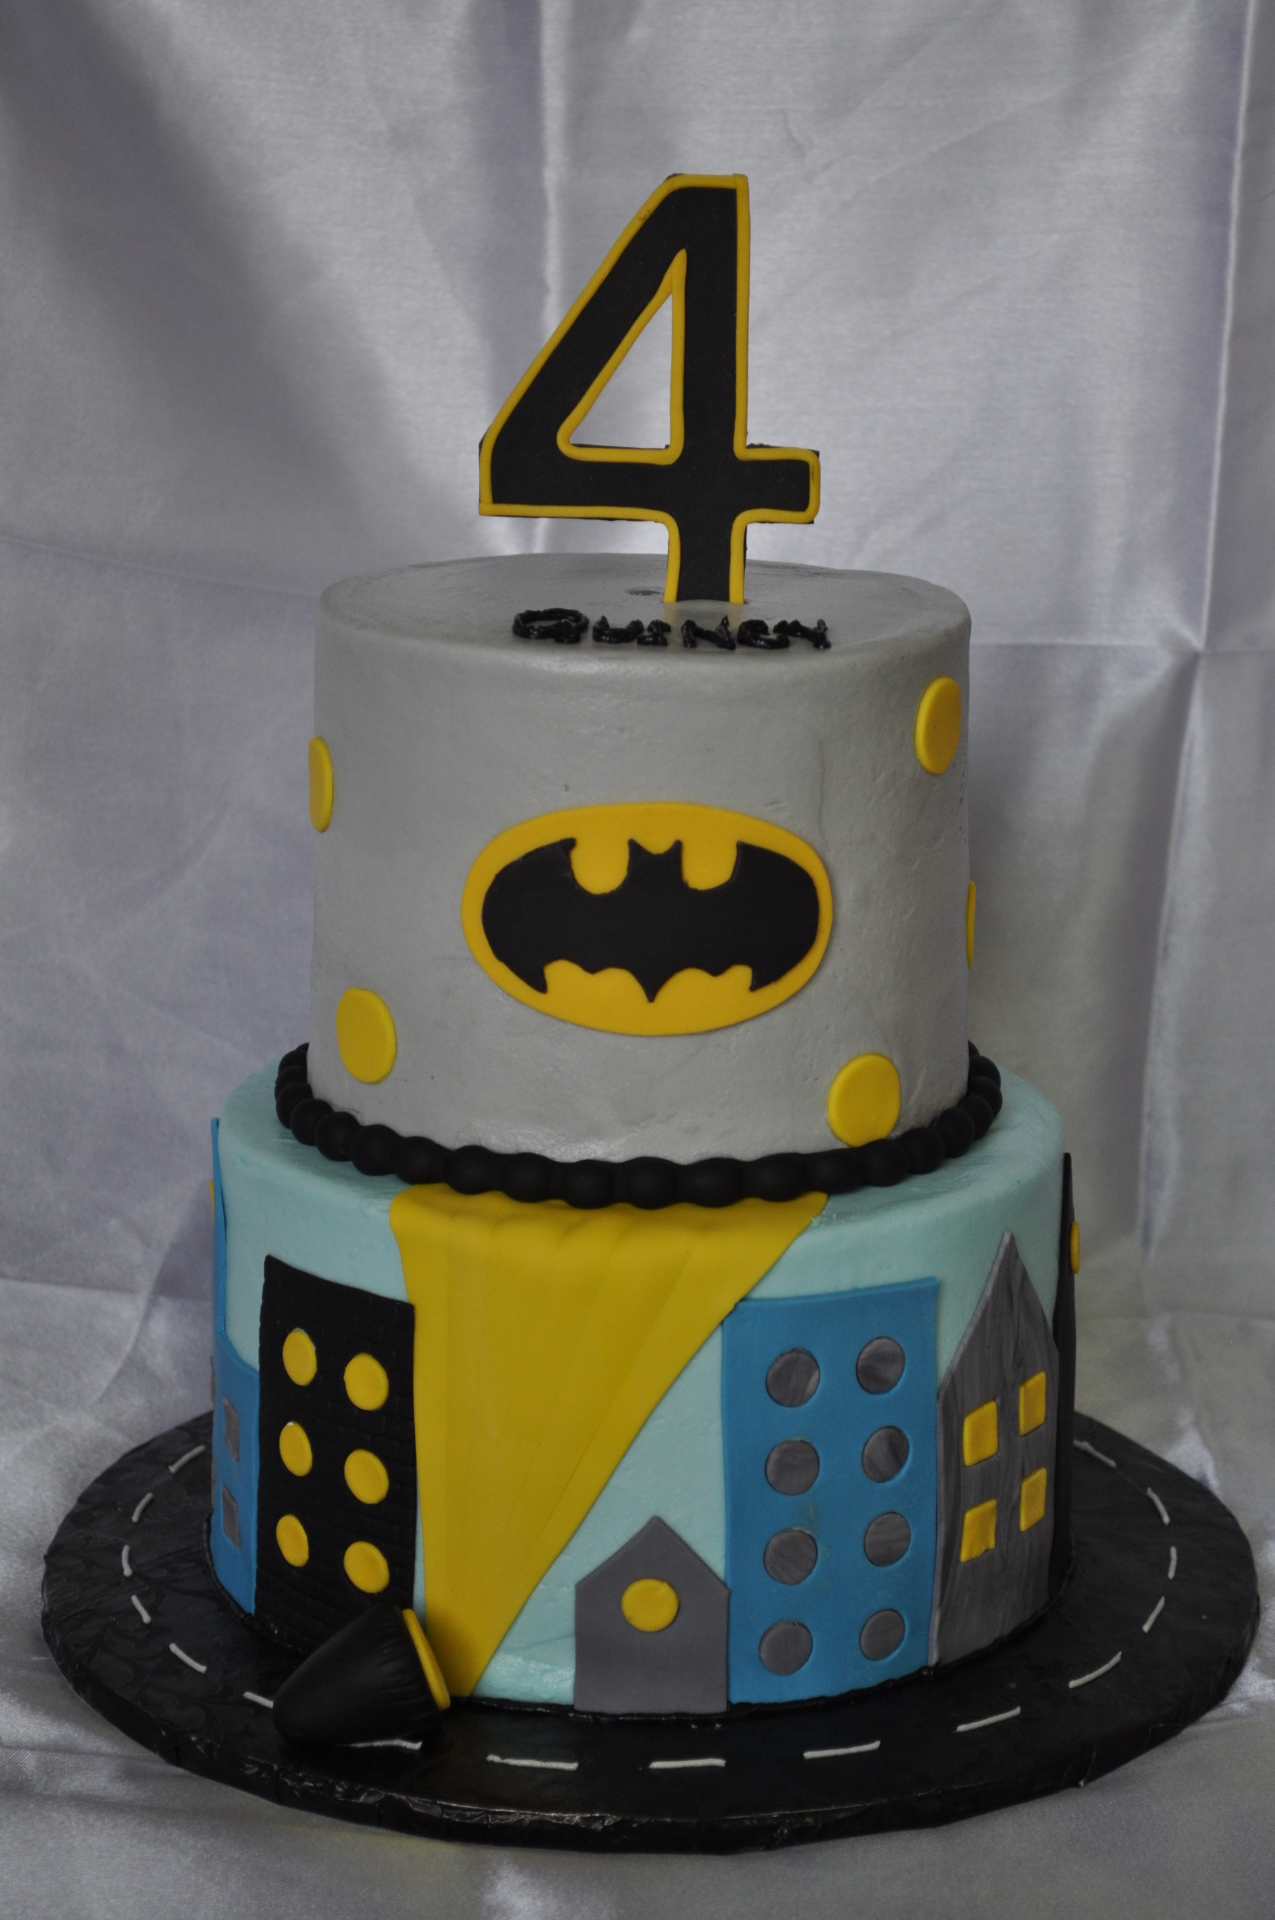 Batman cake, 4th birthday cake